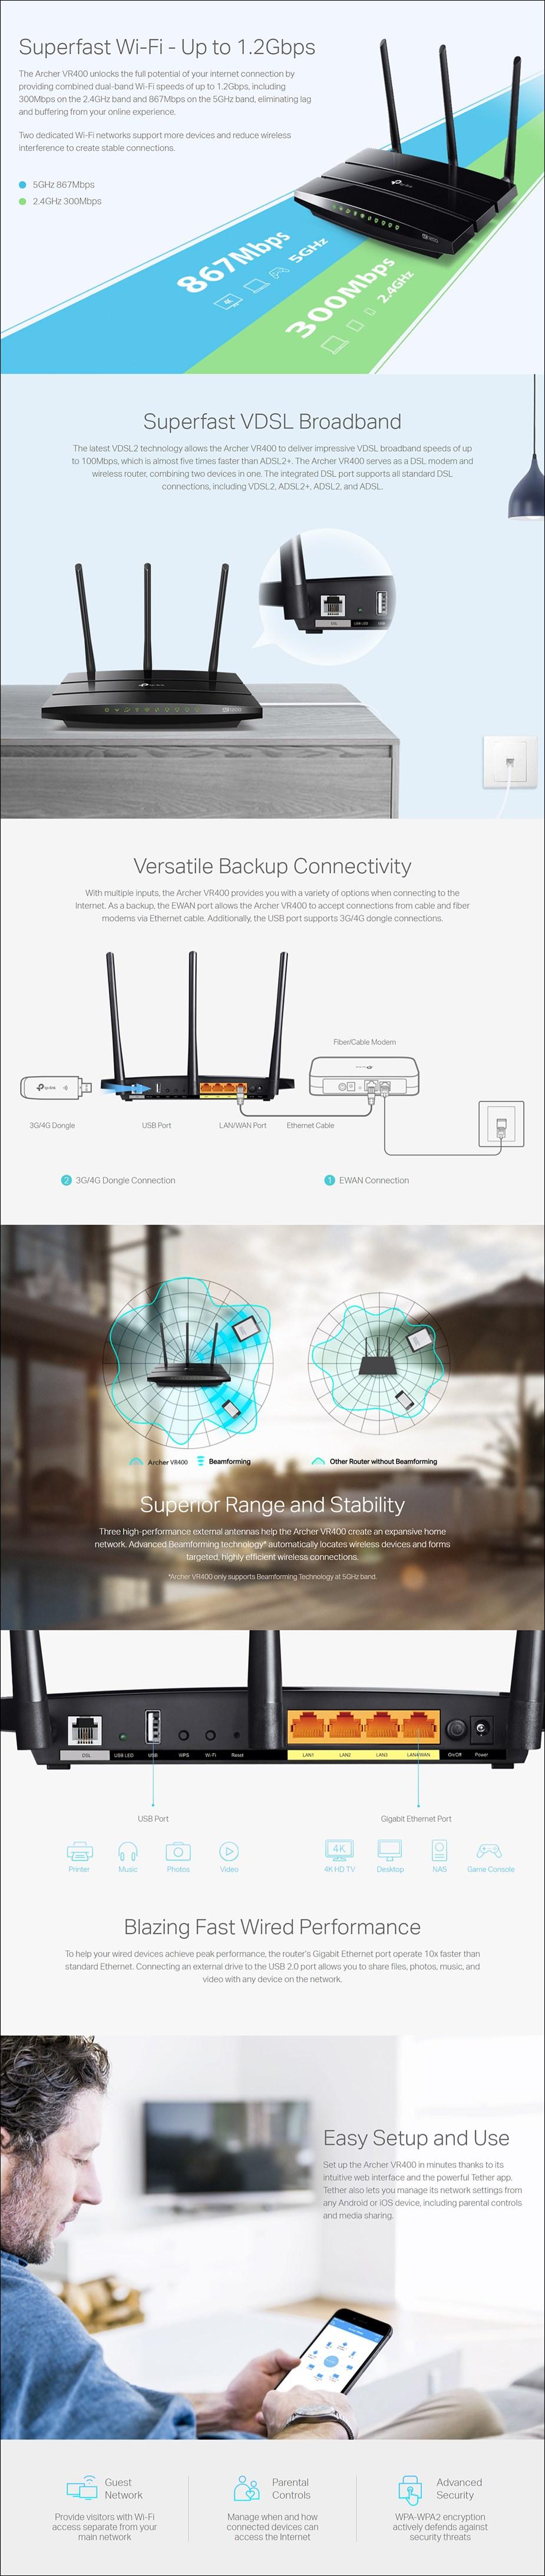 TP-Link Archer VR400 AC1200 Wireless VDSL/ADSL Modem Router - NBN Ready - Overview 1